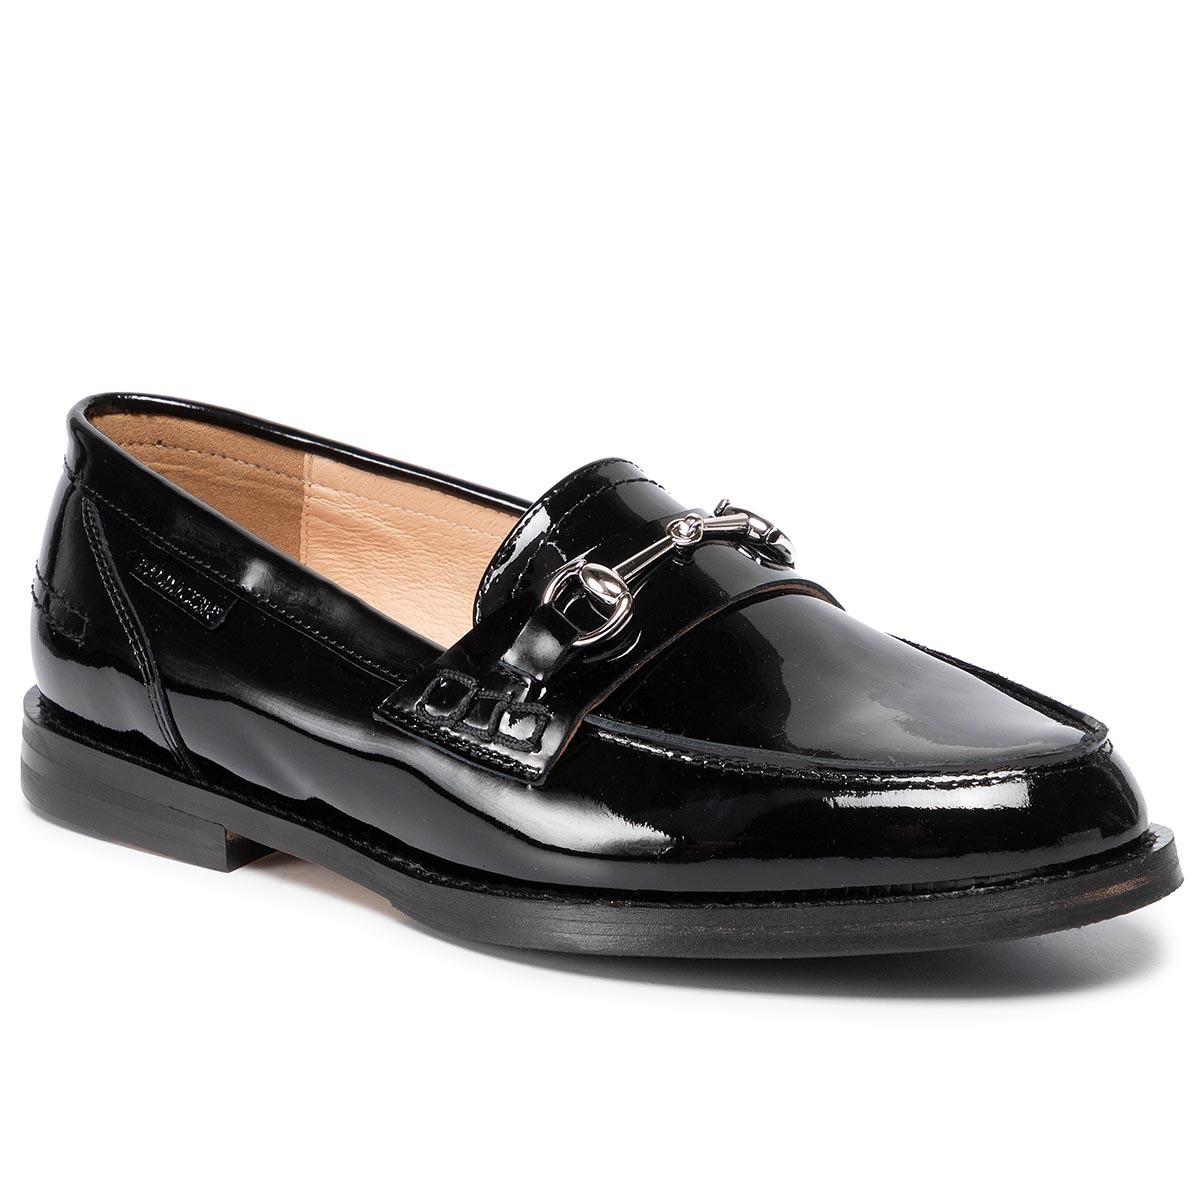 Pantofi BALDACCINI - W-07500 Czarny Lakier